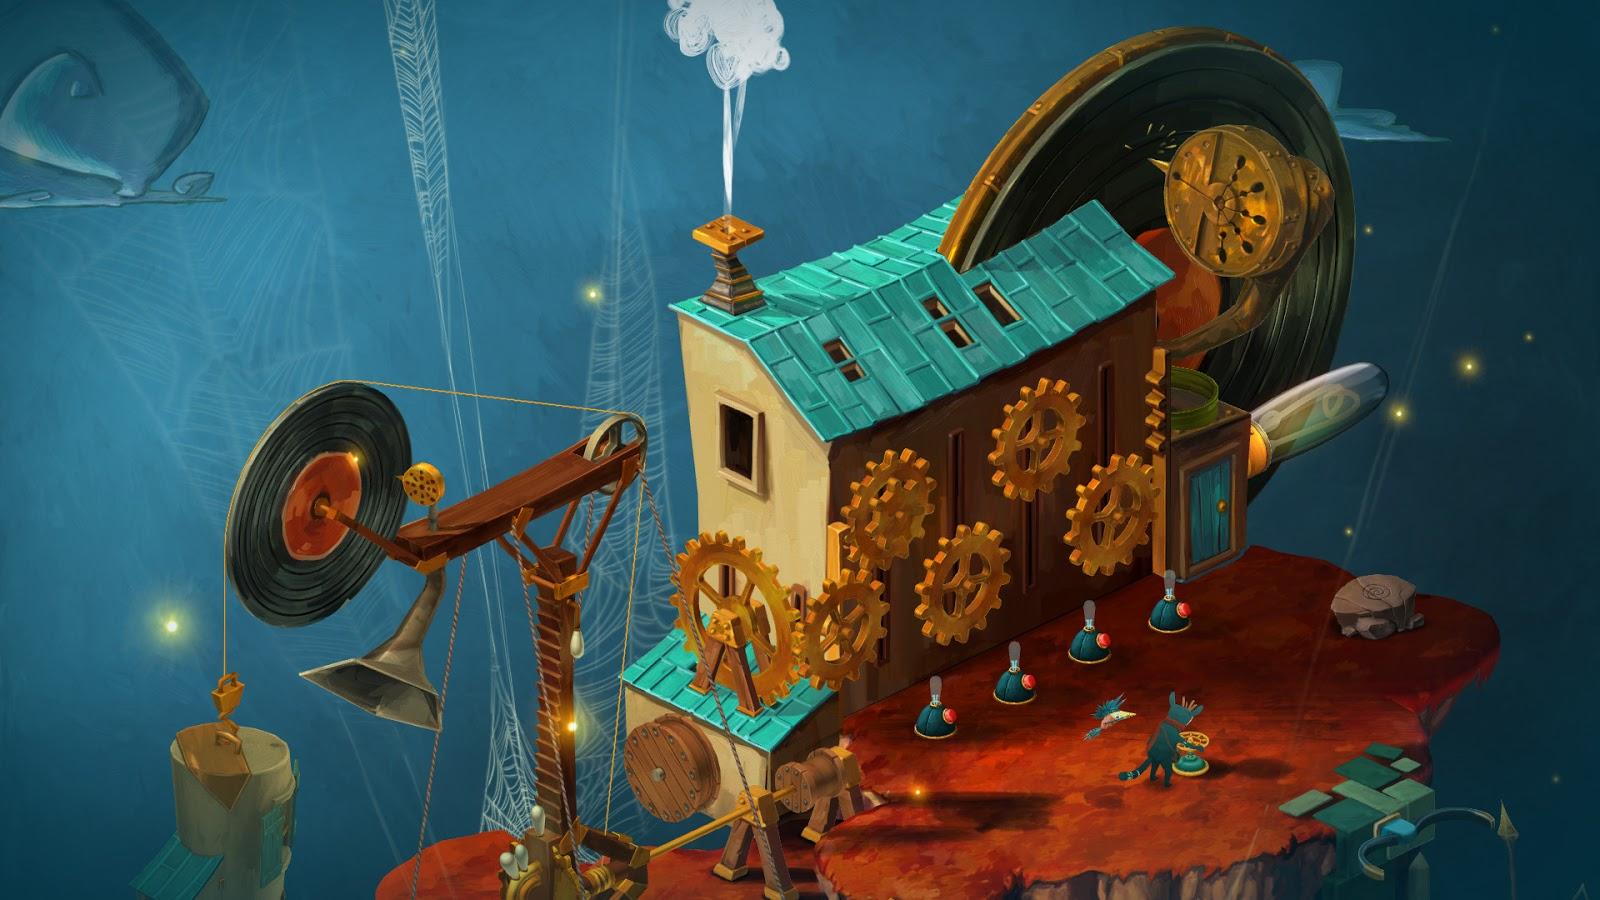 Figment, Bedtime Digital Games, новая игра от атворов создателей разработчиков Chronology и Back to Bed, головоломка, паззл, приключение, фэнтези, Puzzle, Adventure, Fantasy, инди-игра, IndieGame, обзор, рецензия, Review